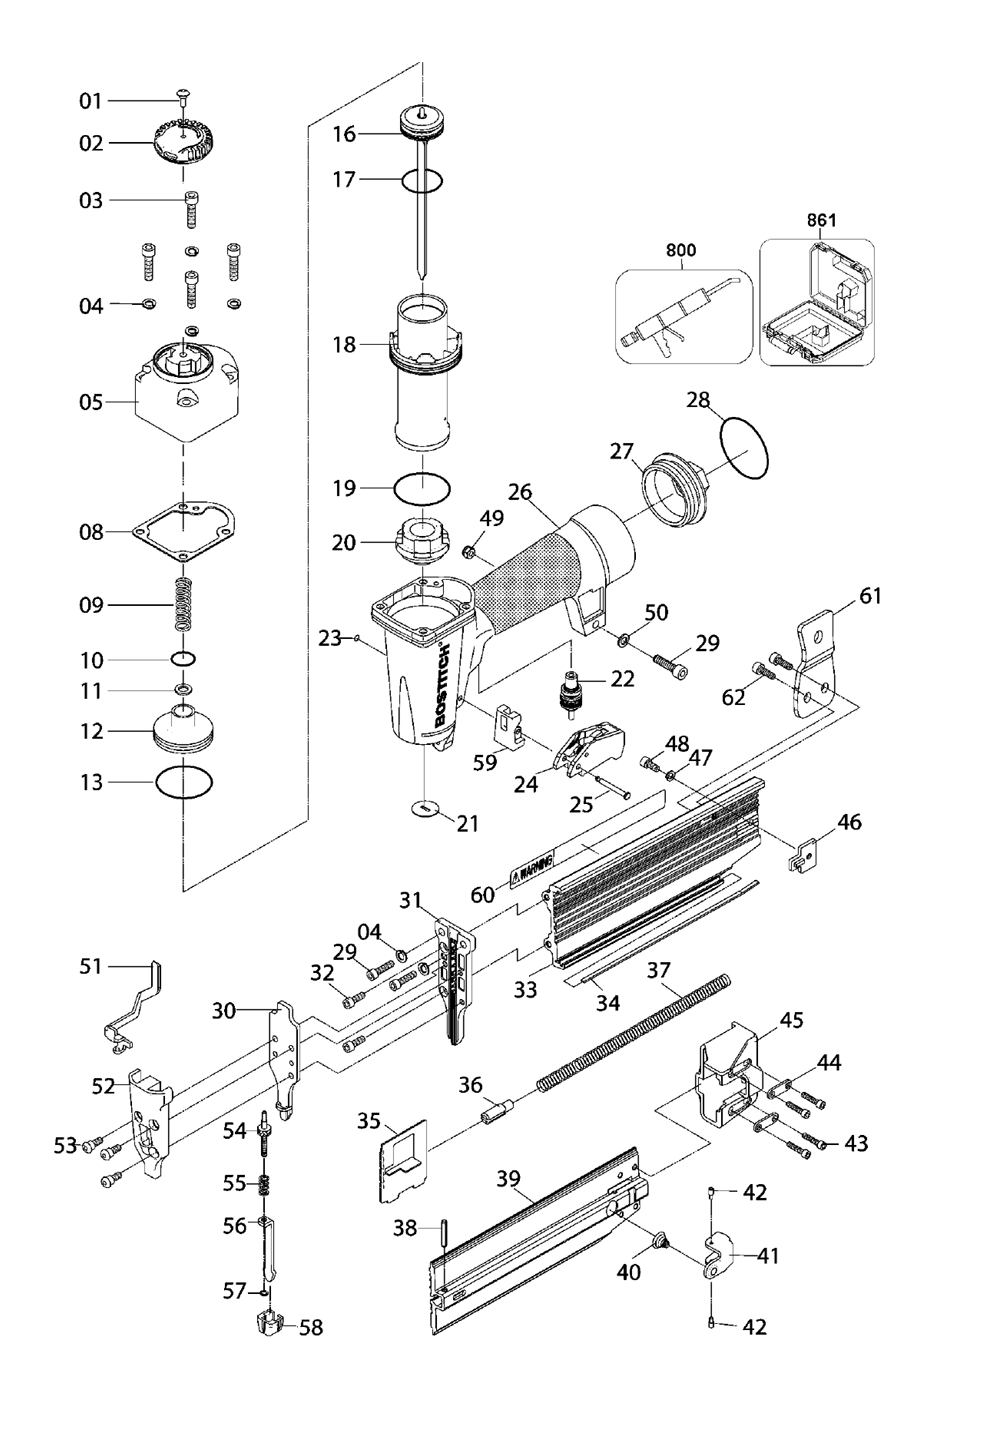 Wiring Diagram For De Walt Air Compressor Manual For Air